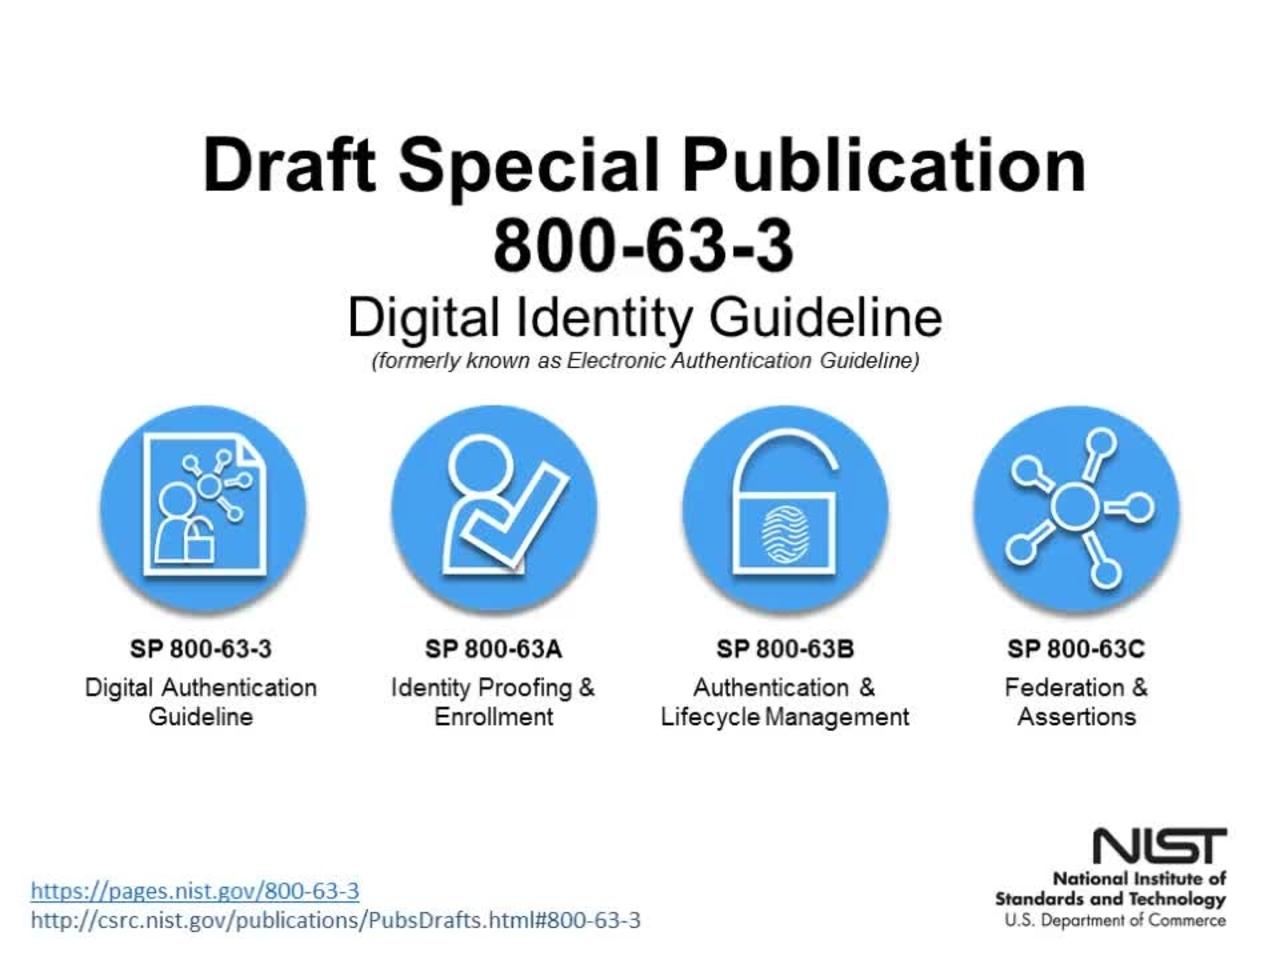 Special Publication 800-63-3 Public Draft Webinar